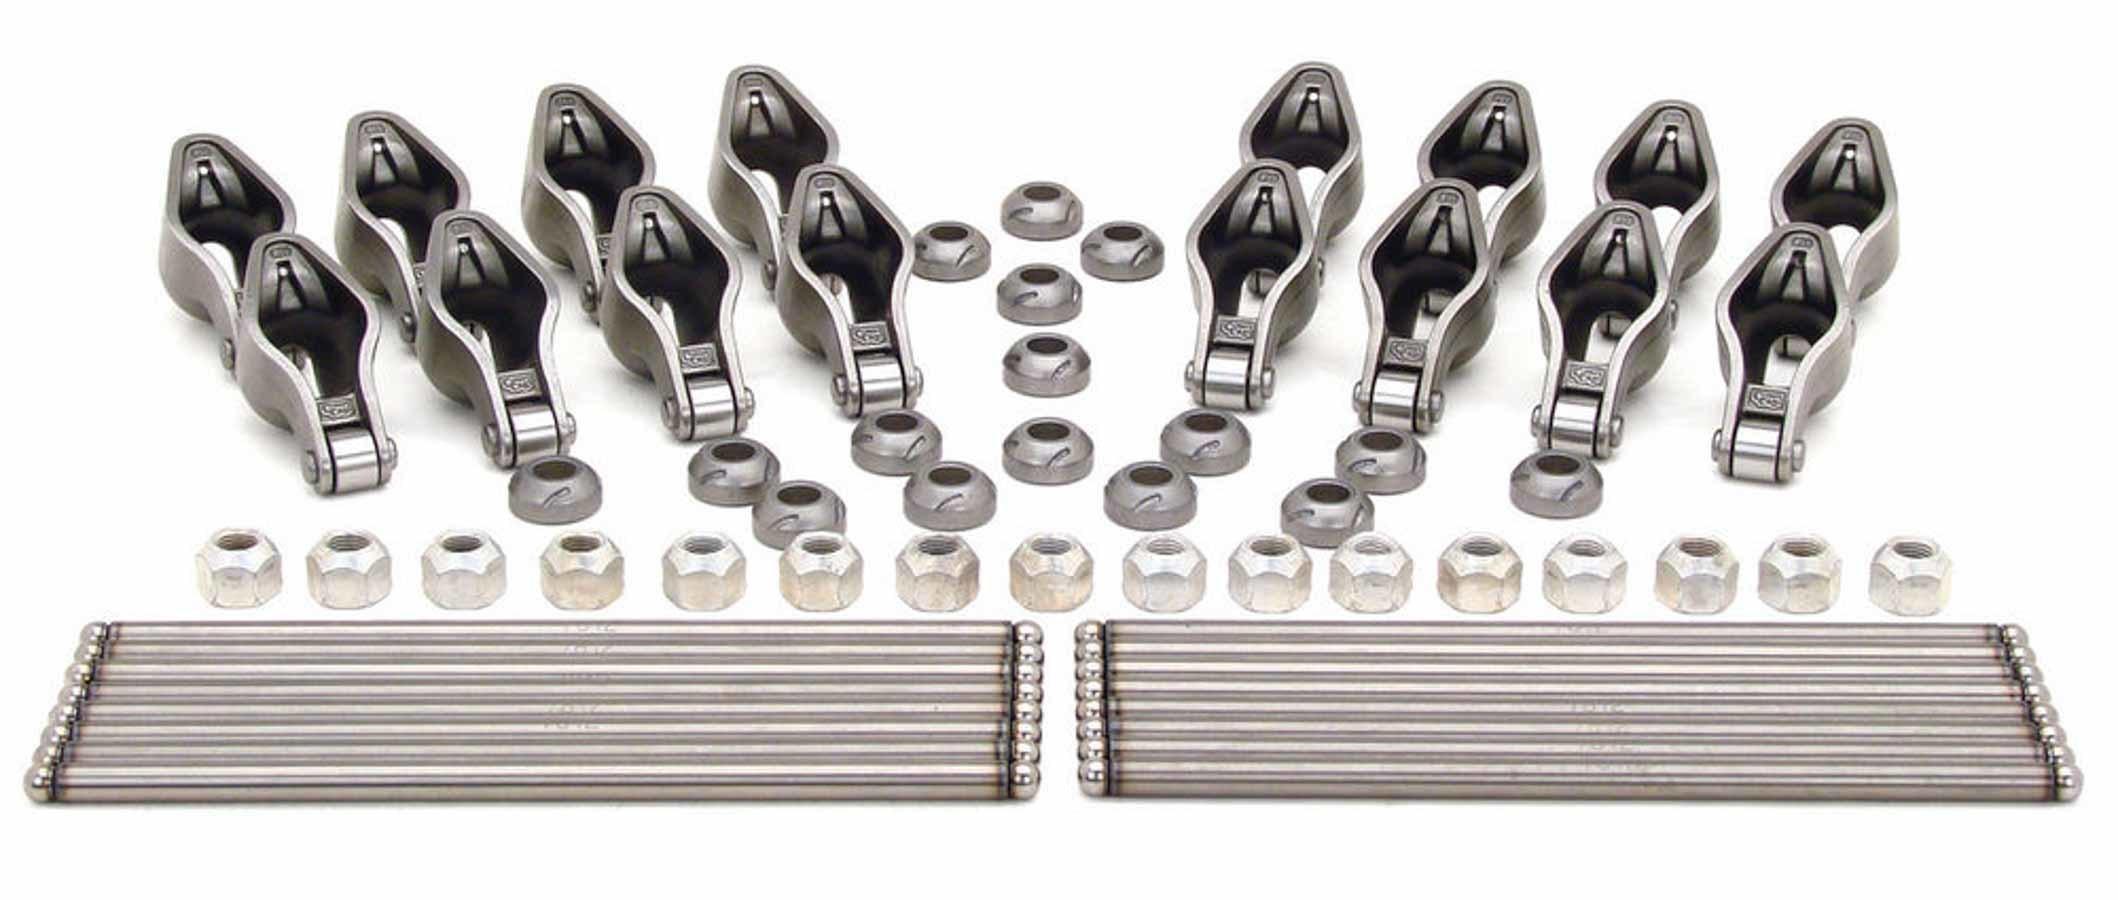 Comp Cams Sbc Rocker Arm Kit 1.52 Ratio- 3/8 Stud